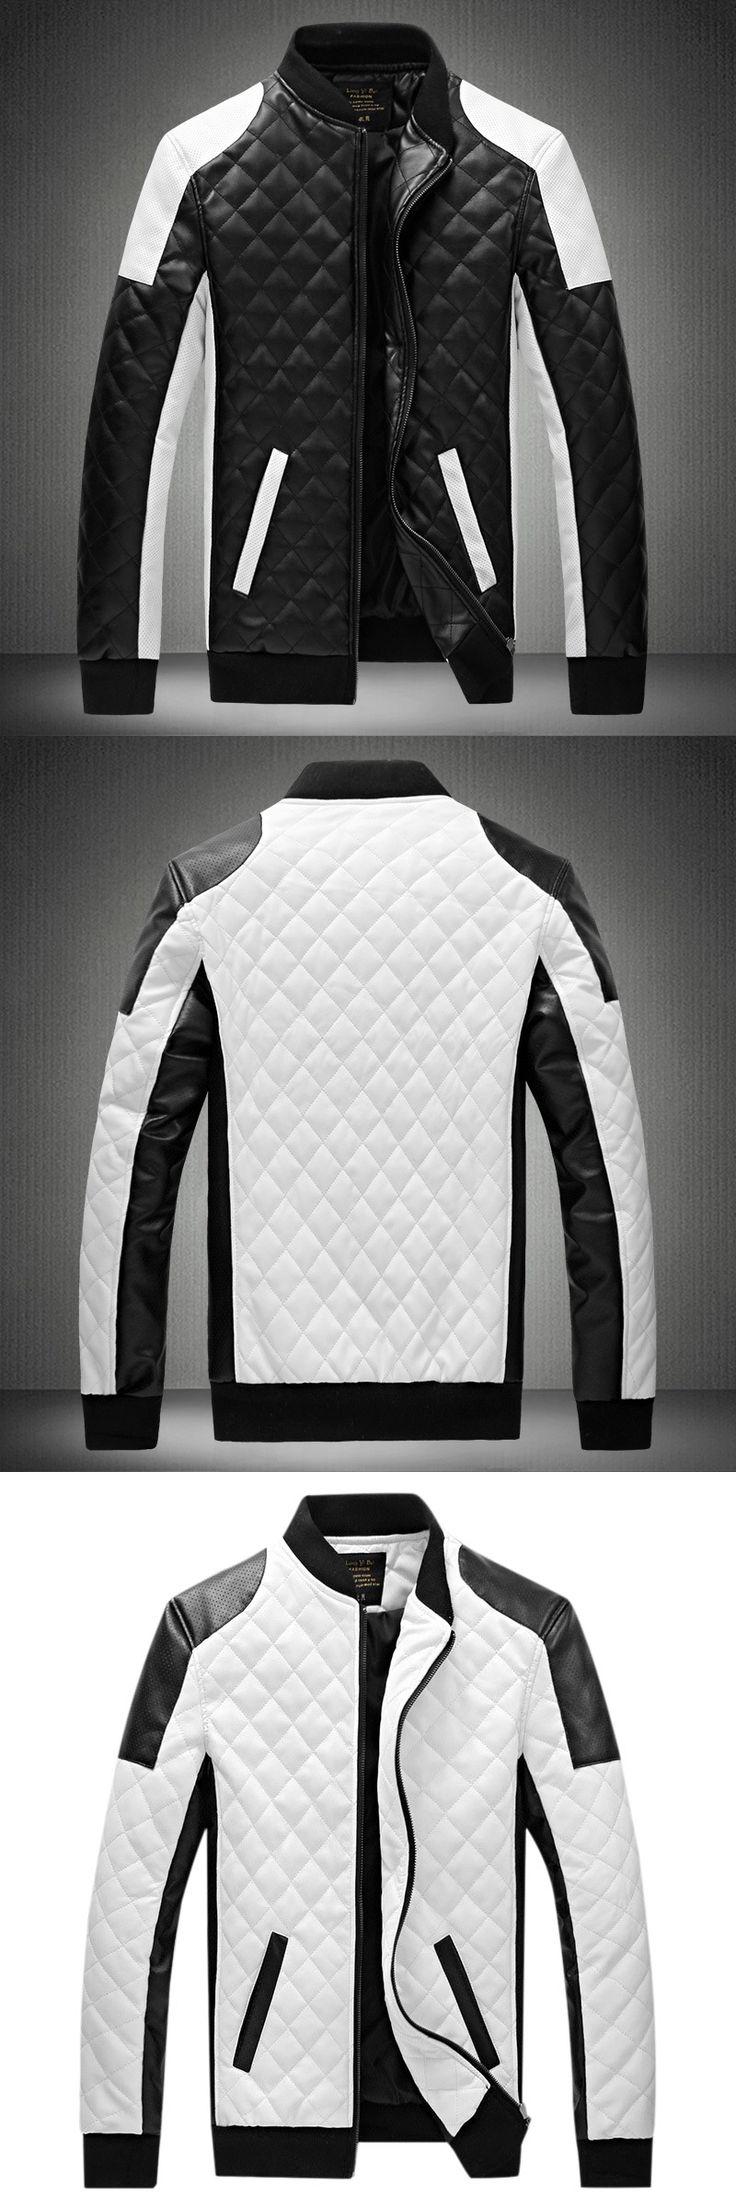 6XL 2017 New Brand Leather Jacket Mens Plus Size Winbreak Patchwork Black&White Pu Jacket Thin&Thick Warm Motorcycle Coats XA049